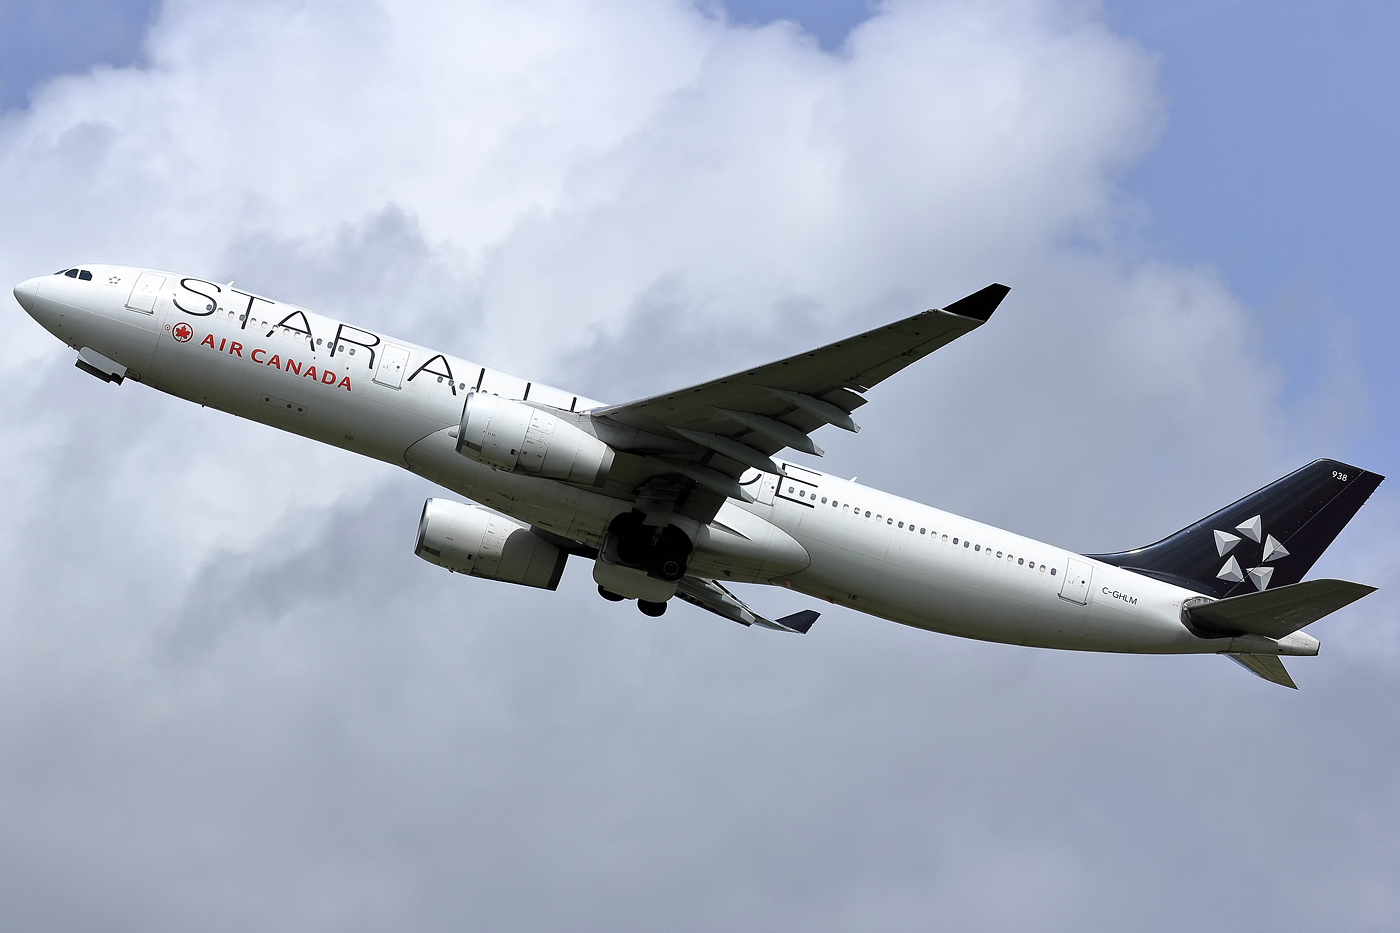 Re:[原创]【AMS】听说今天要发330?? AIRBUS A330-300 C-GHLM 荷兰阿姆斯特丹史基浦机场